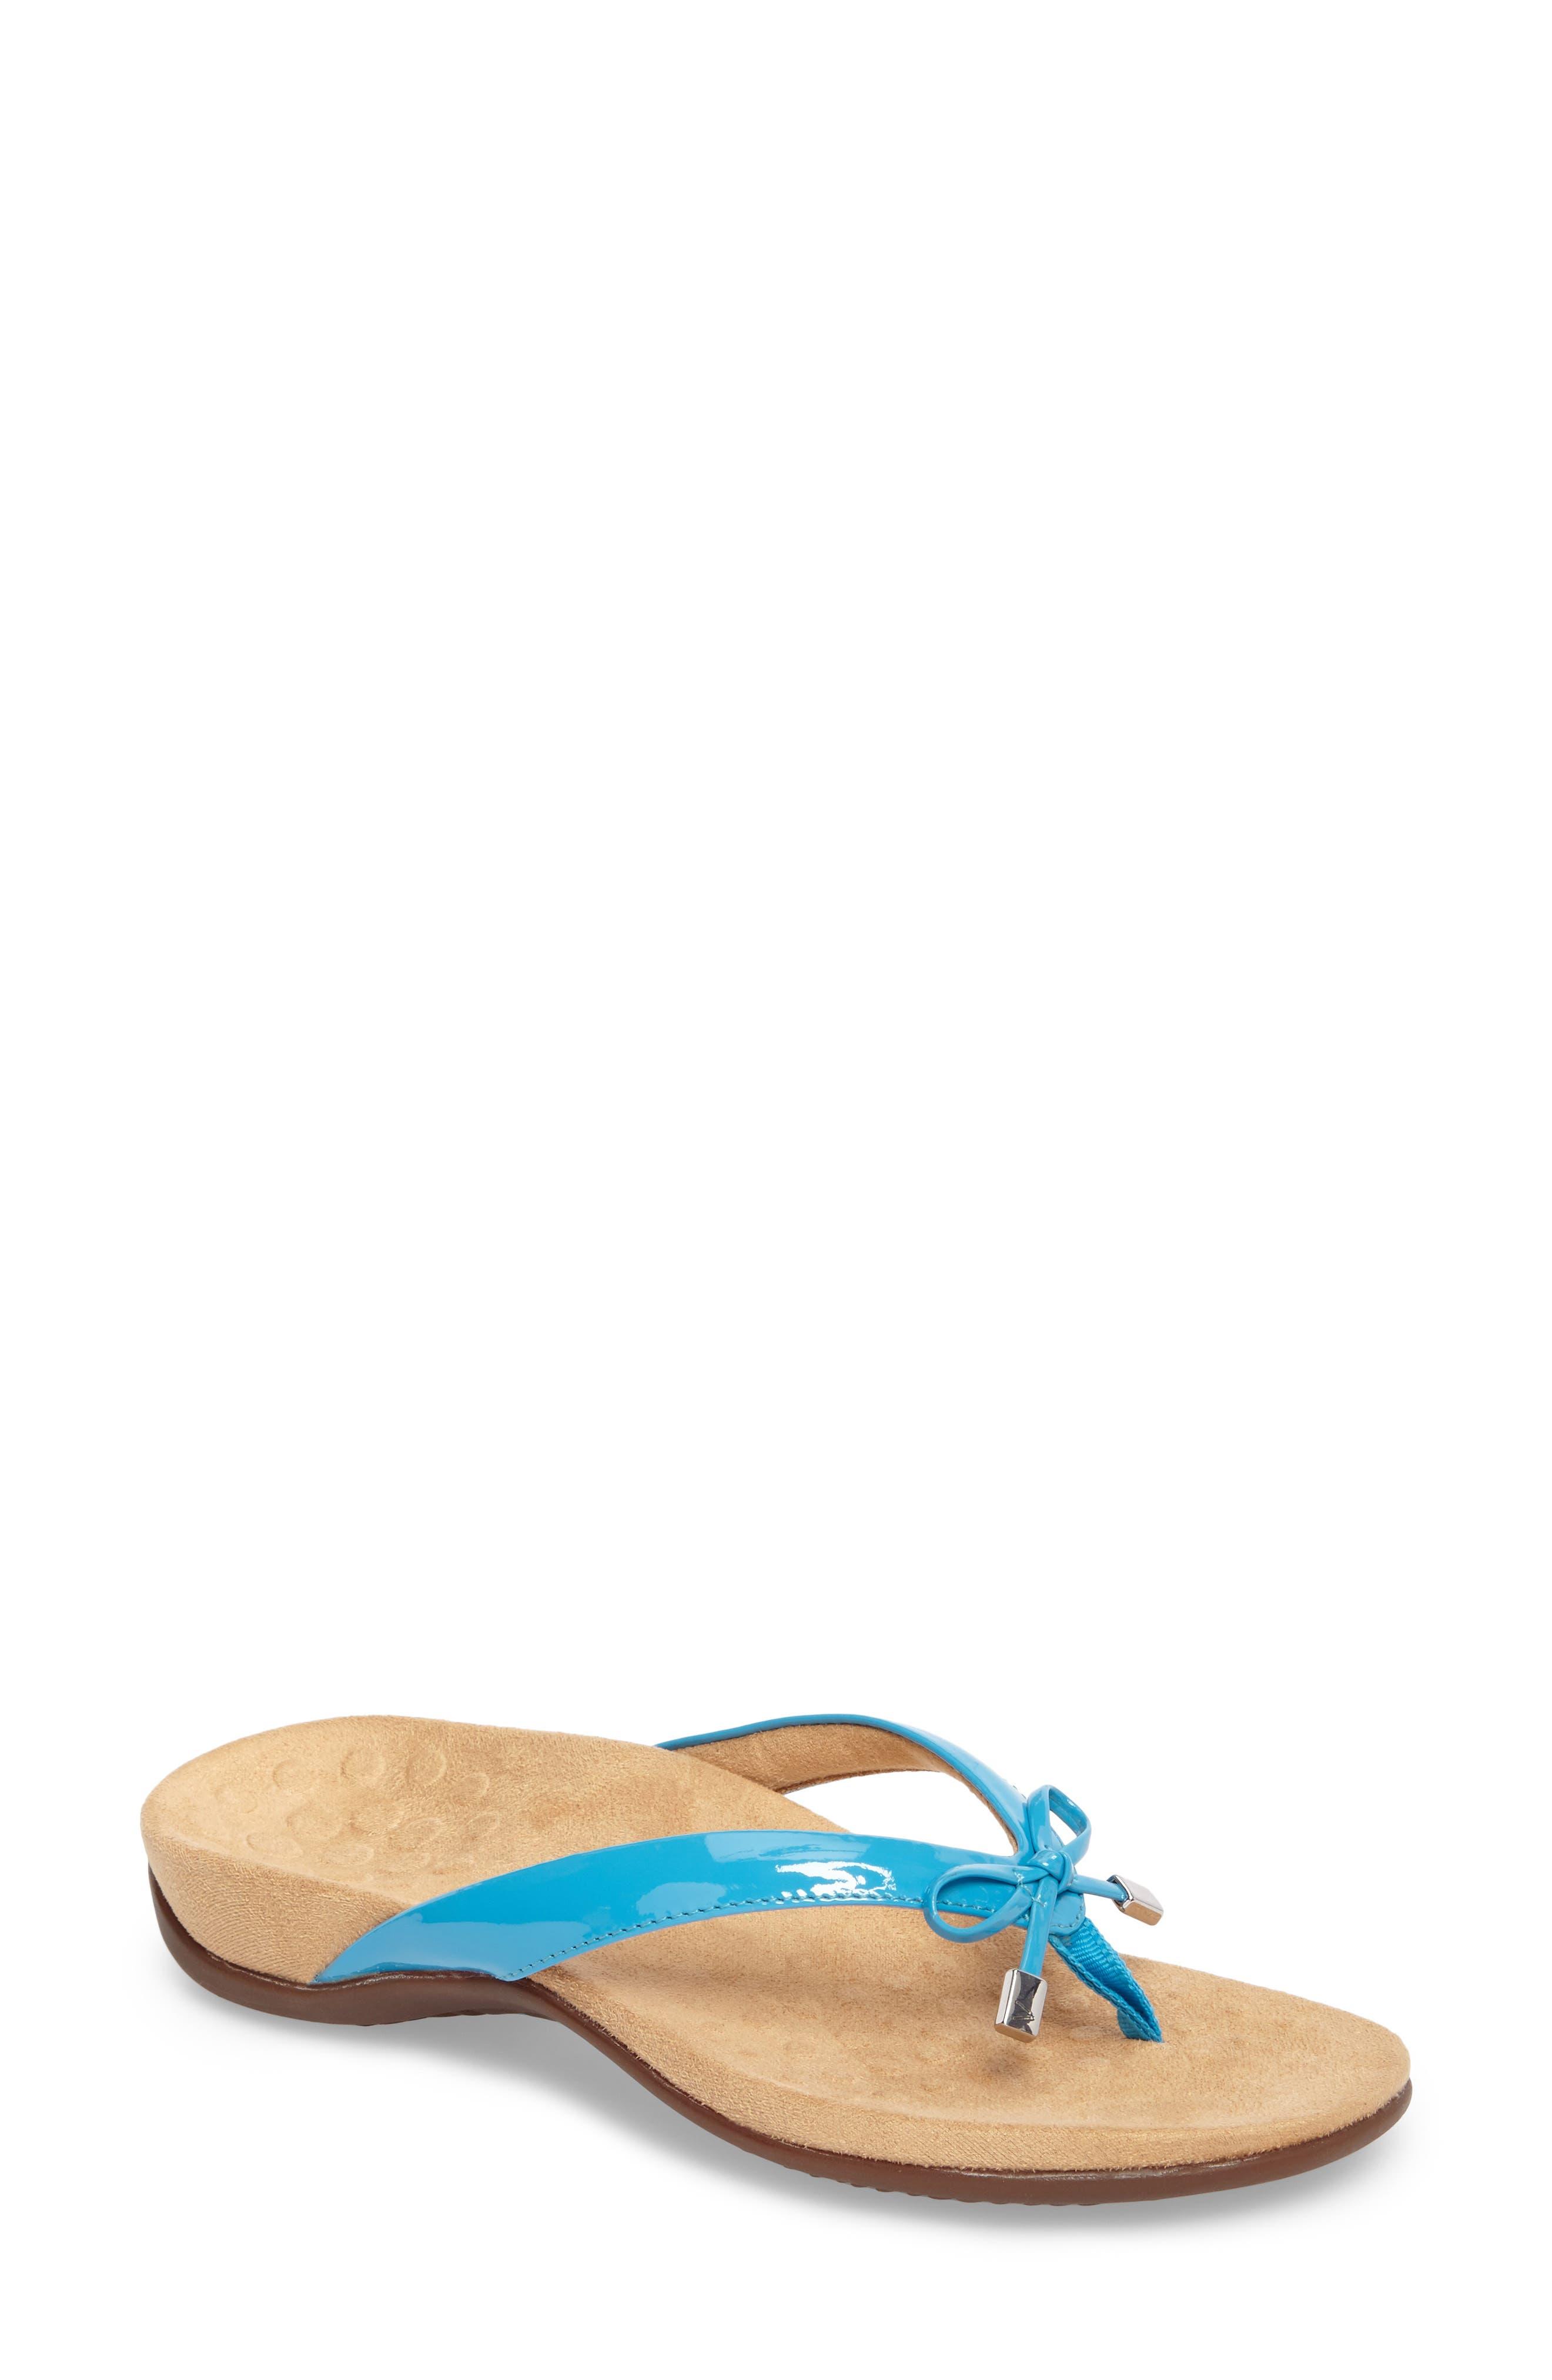 Main Image - Vionic 'Bella II' Sandal (Women)